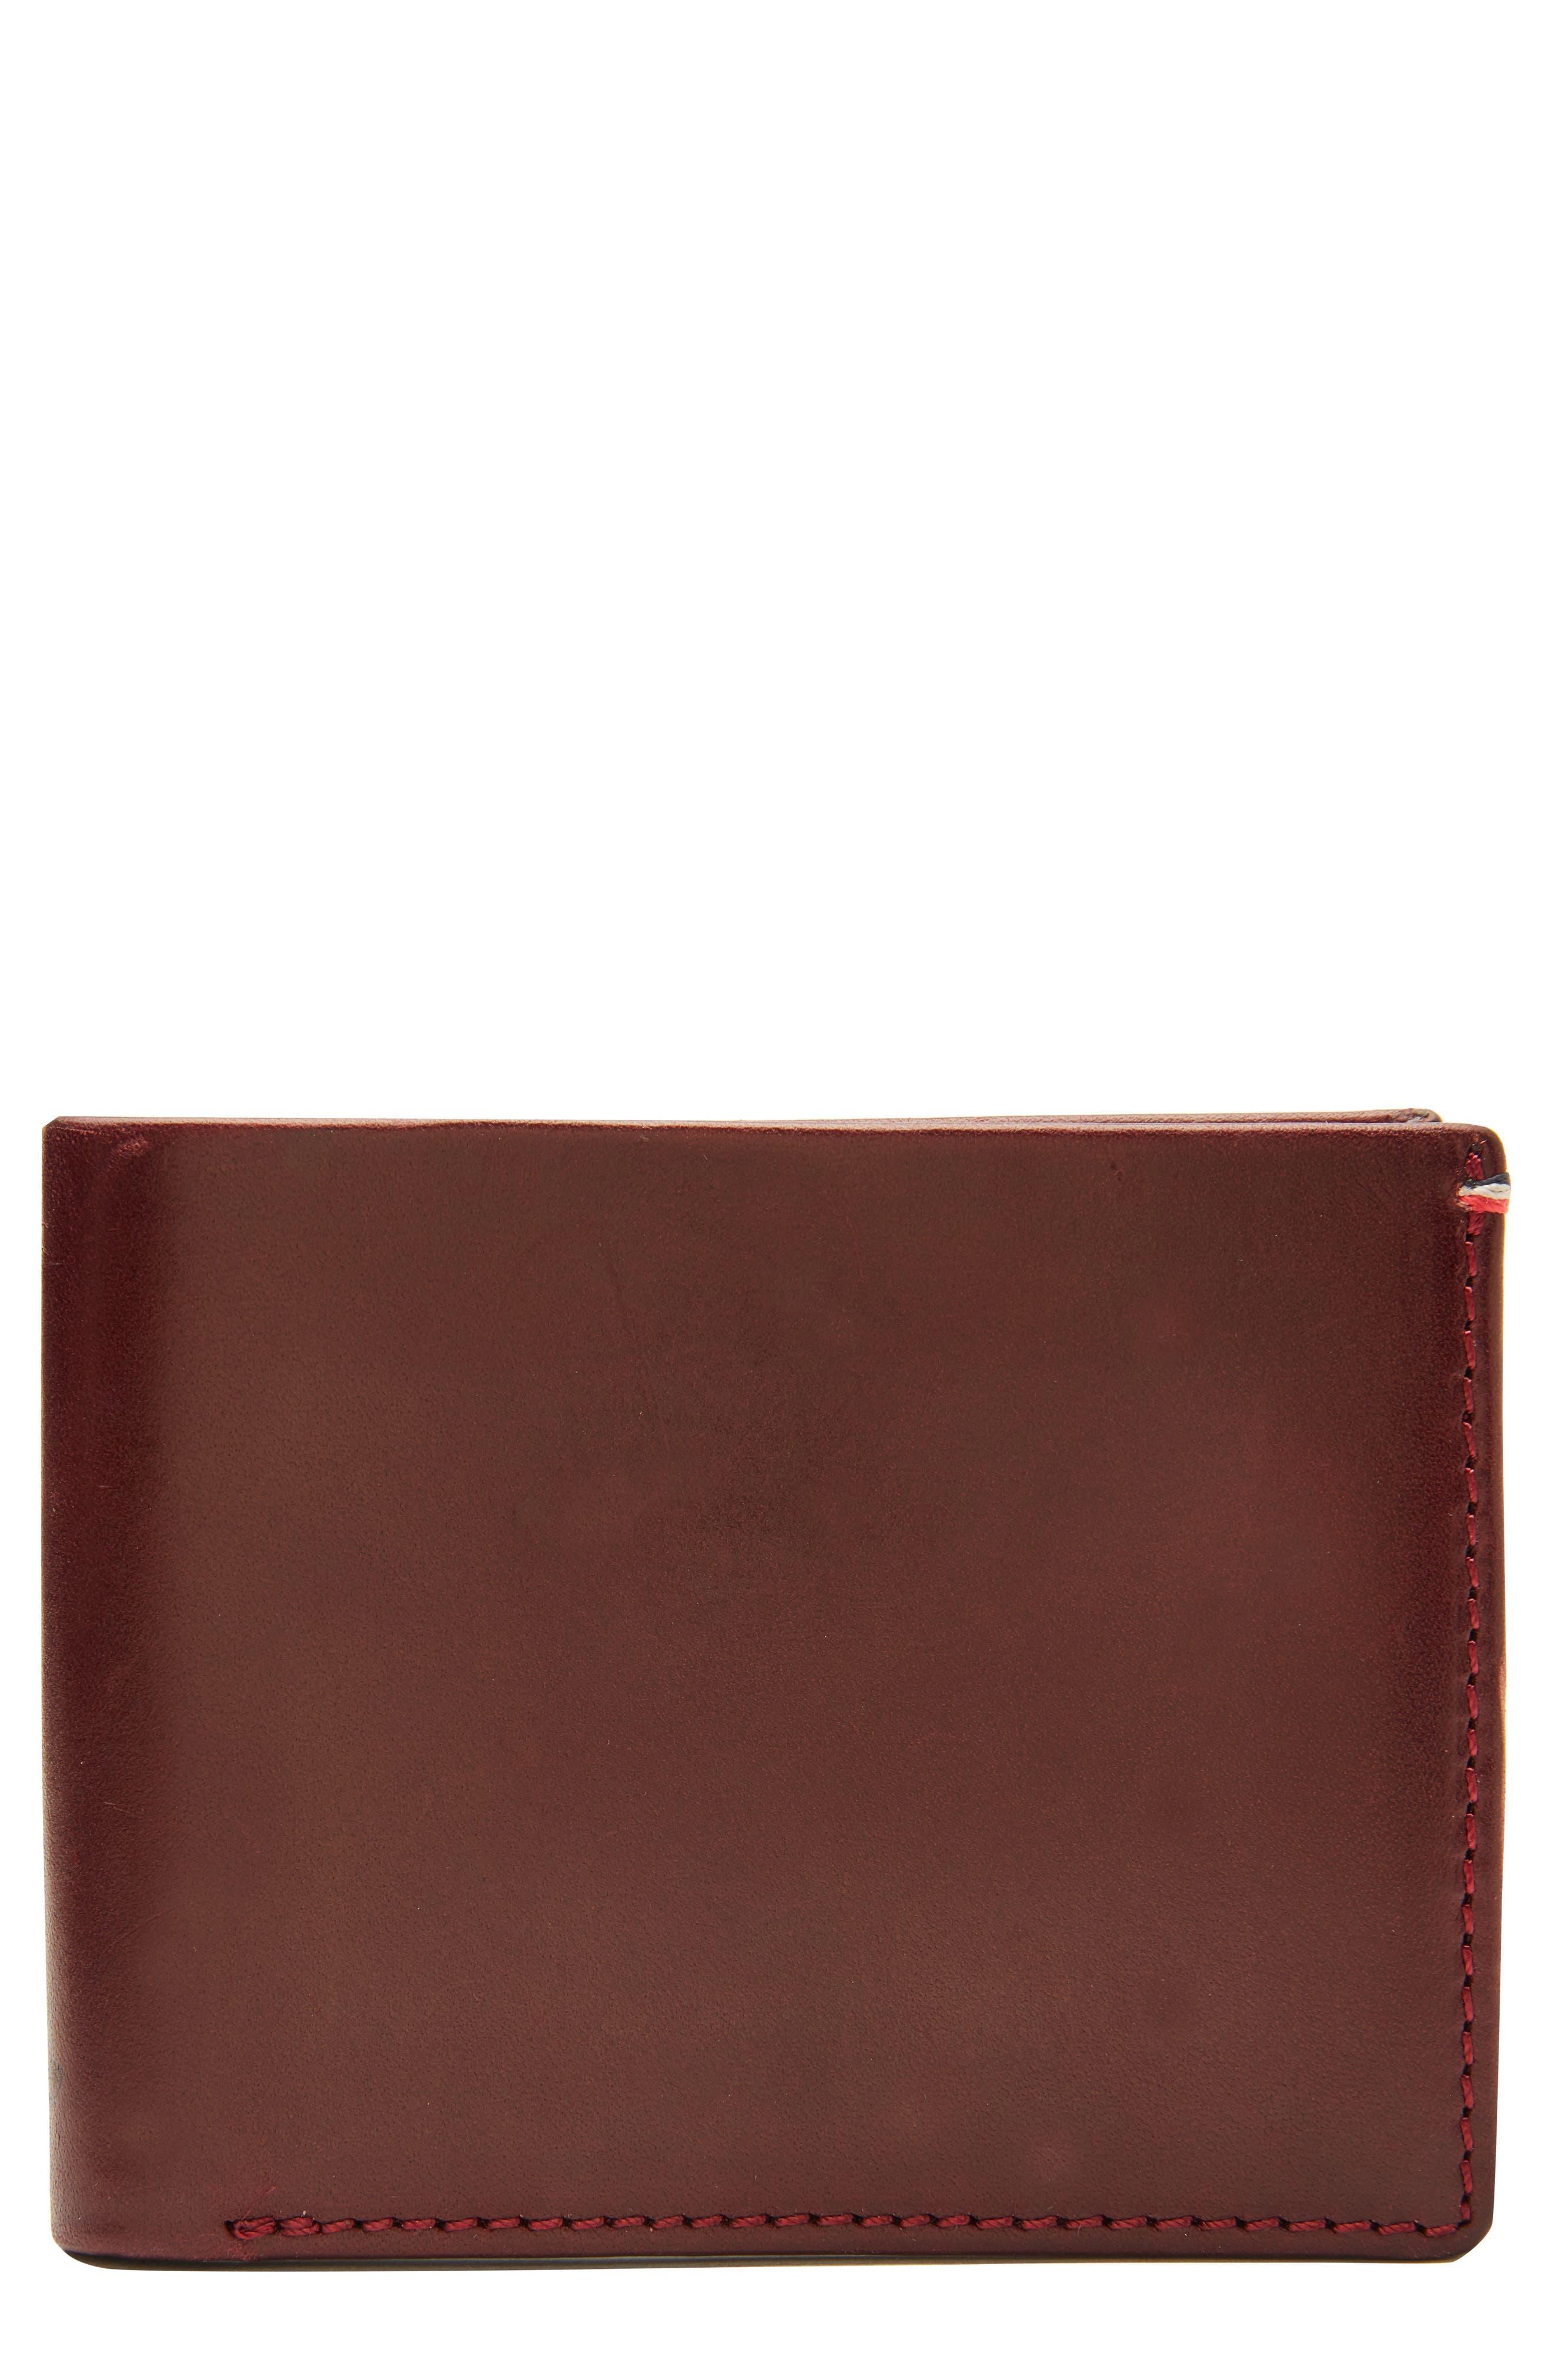 Core Leather Wallet,                             Main thumbnail 3, color,